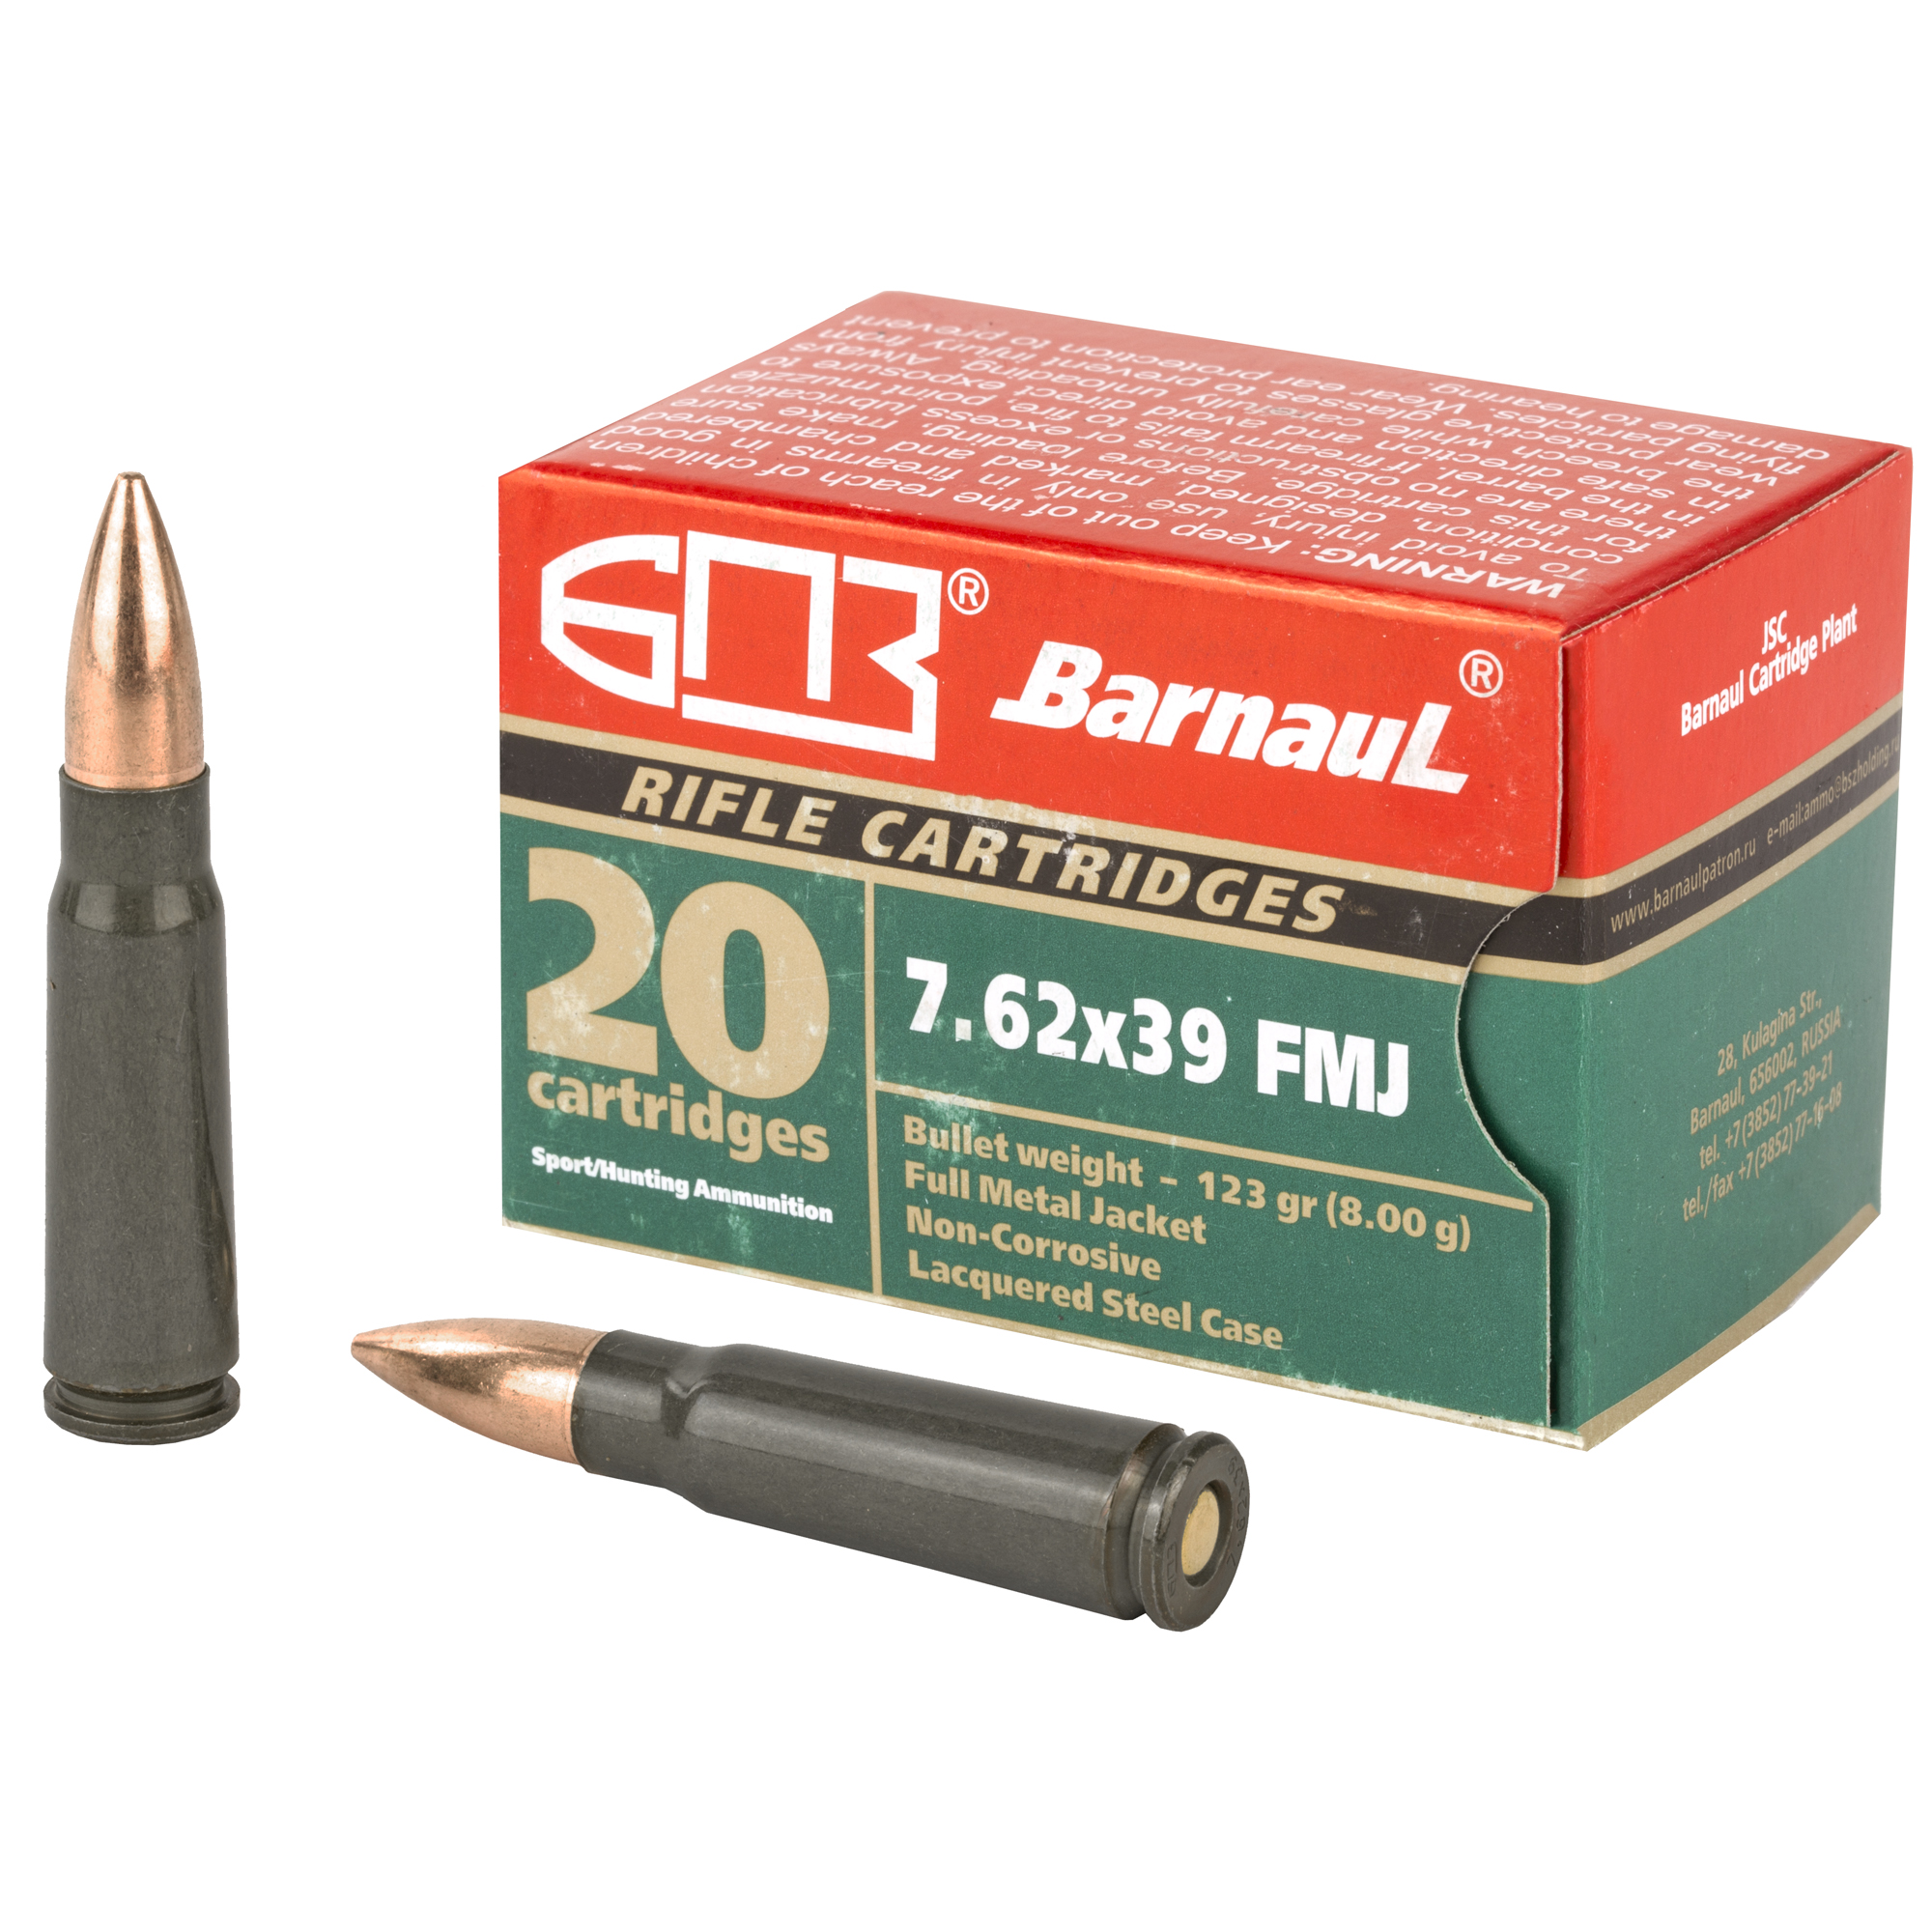 Barnaul 7.62x39mm 123 GR. FMJBT - Steel Case - 20RD